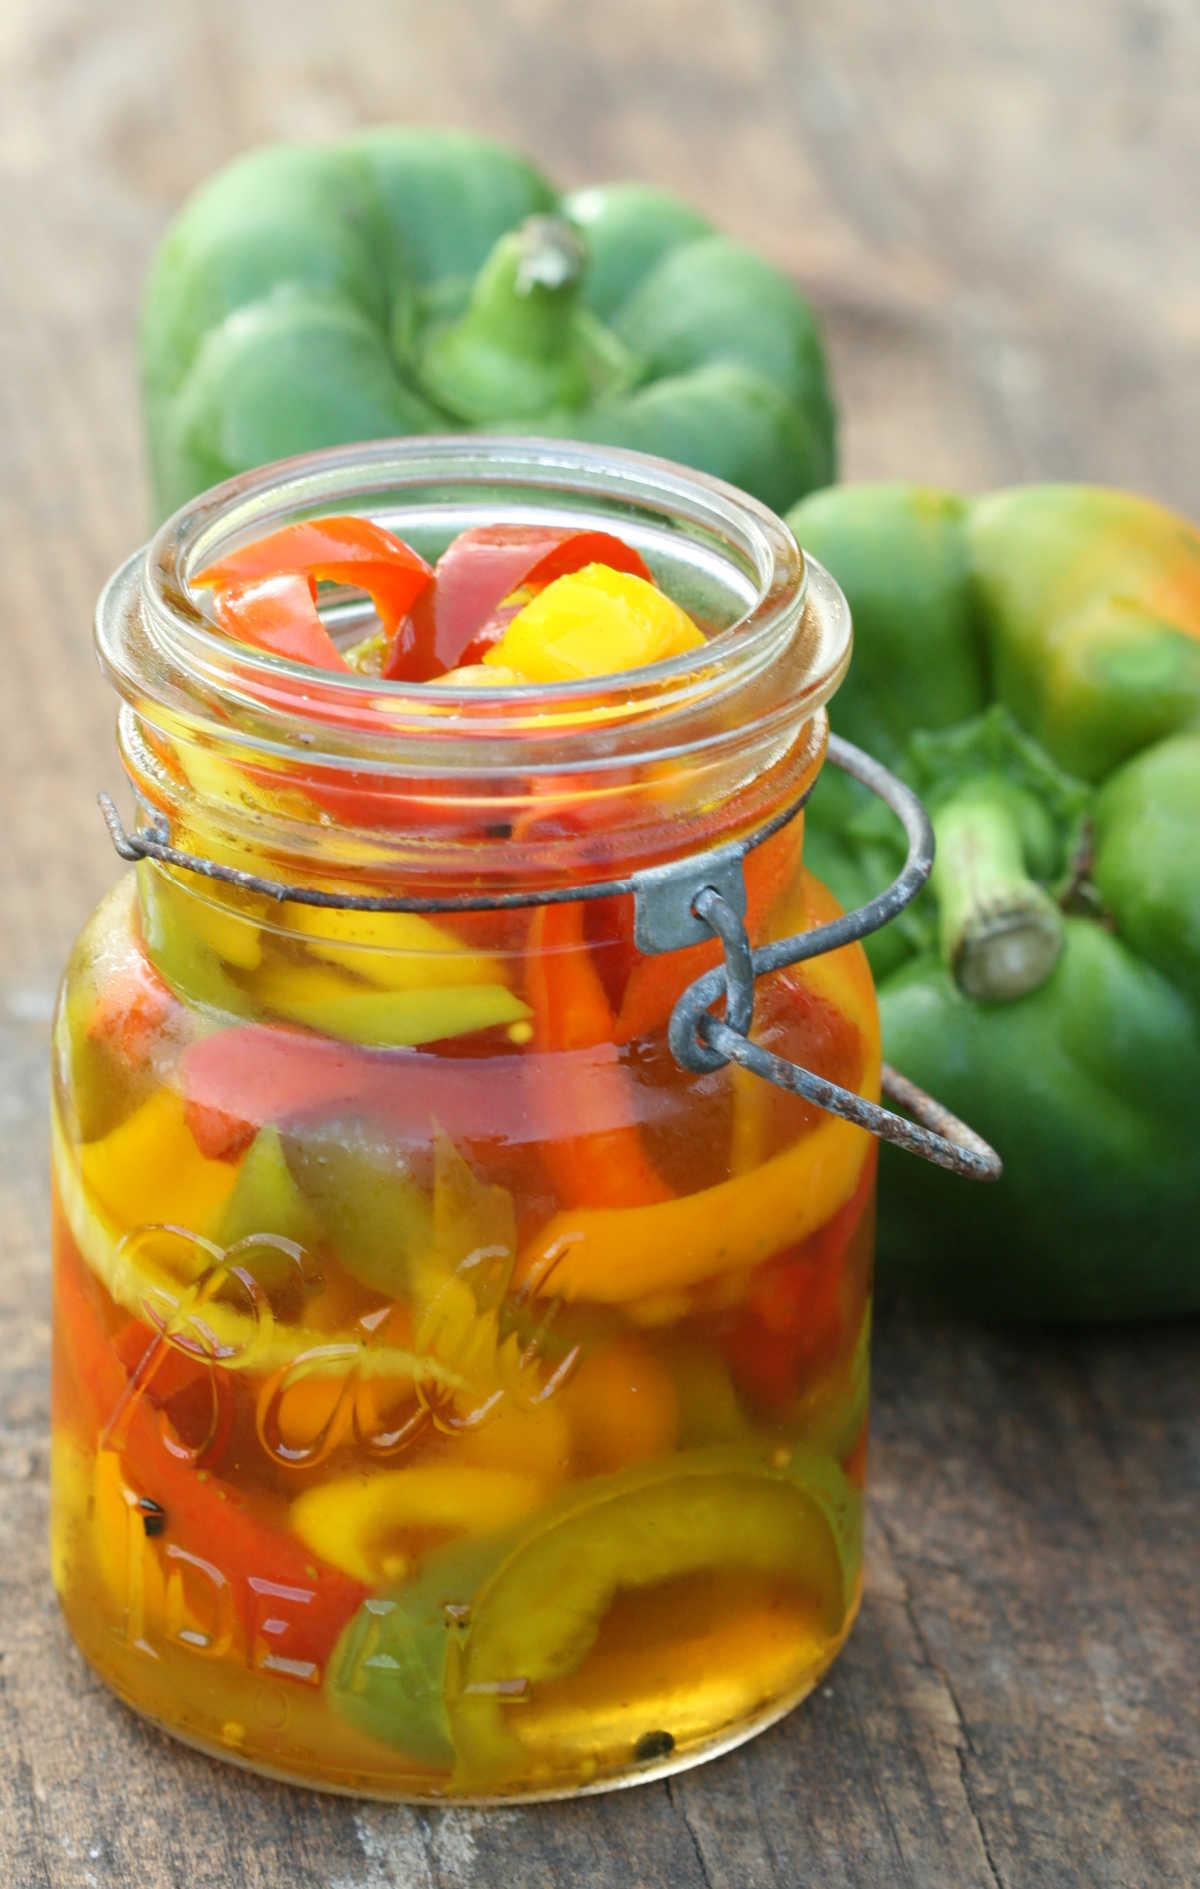 Vintage Mason jar of pickling peppers on reclaimed wood board.